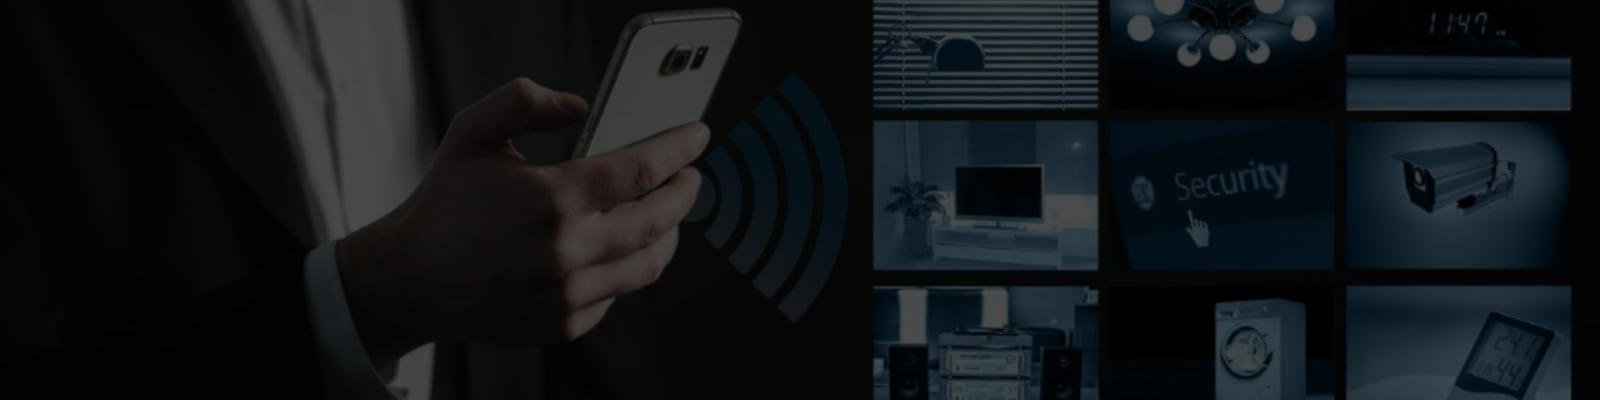 wifi installation pros in Johannesburg